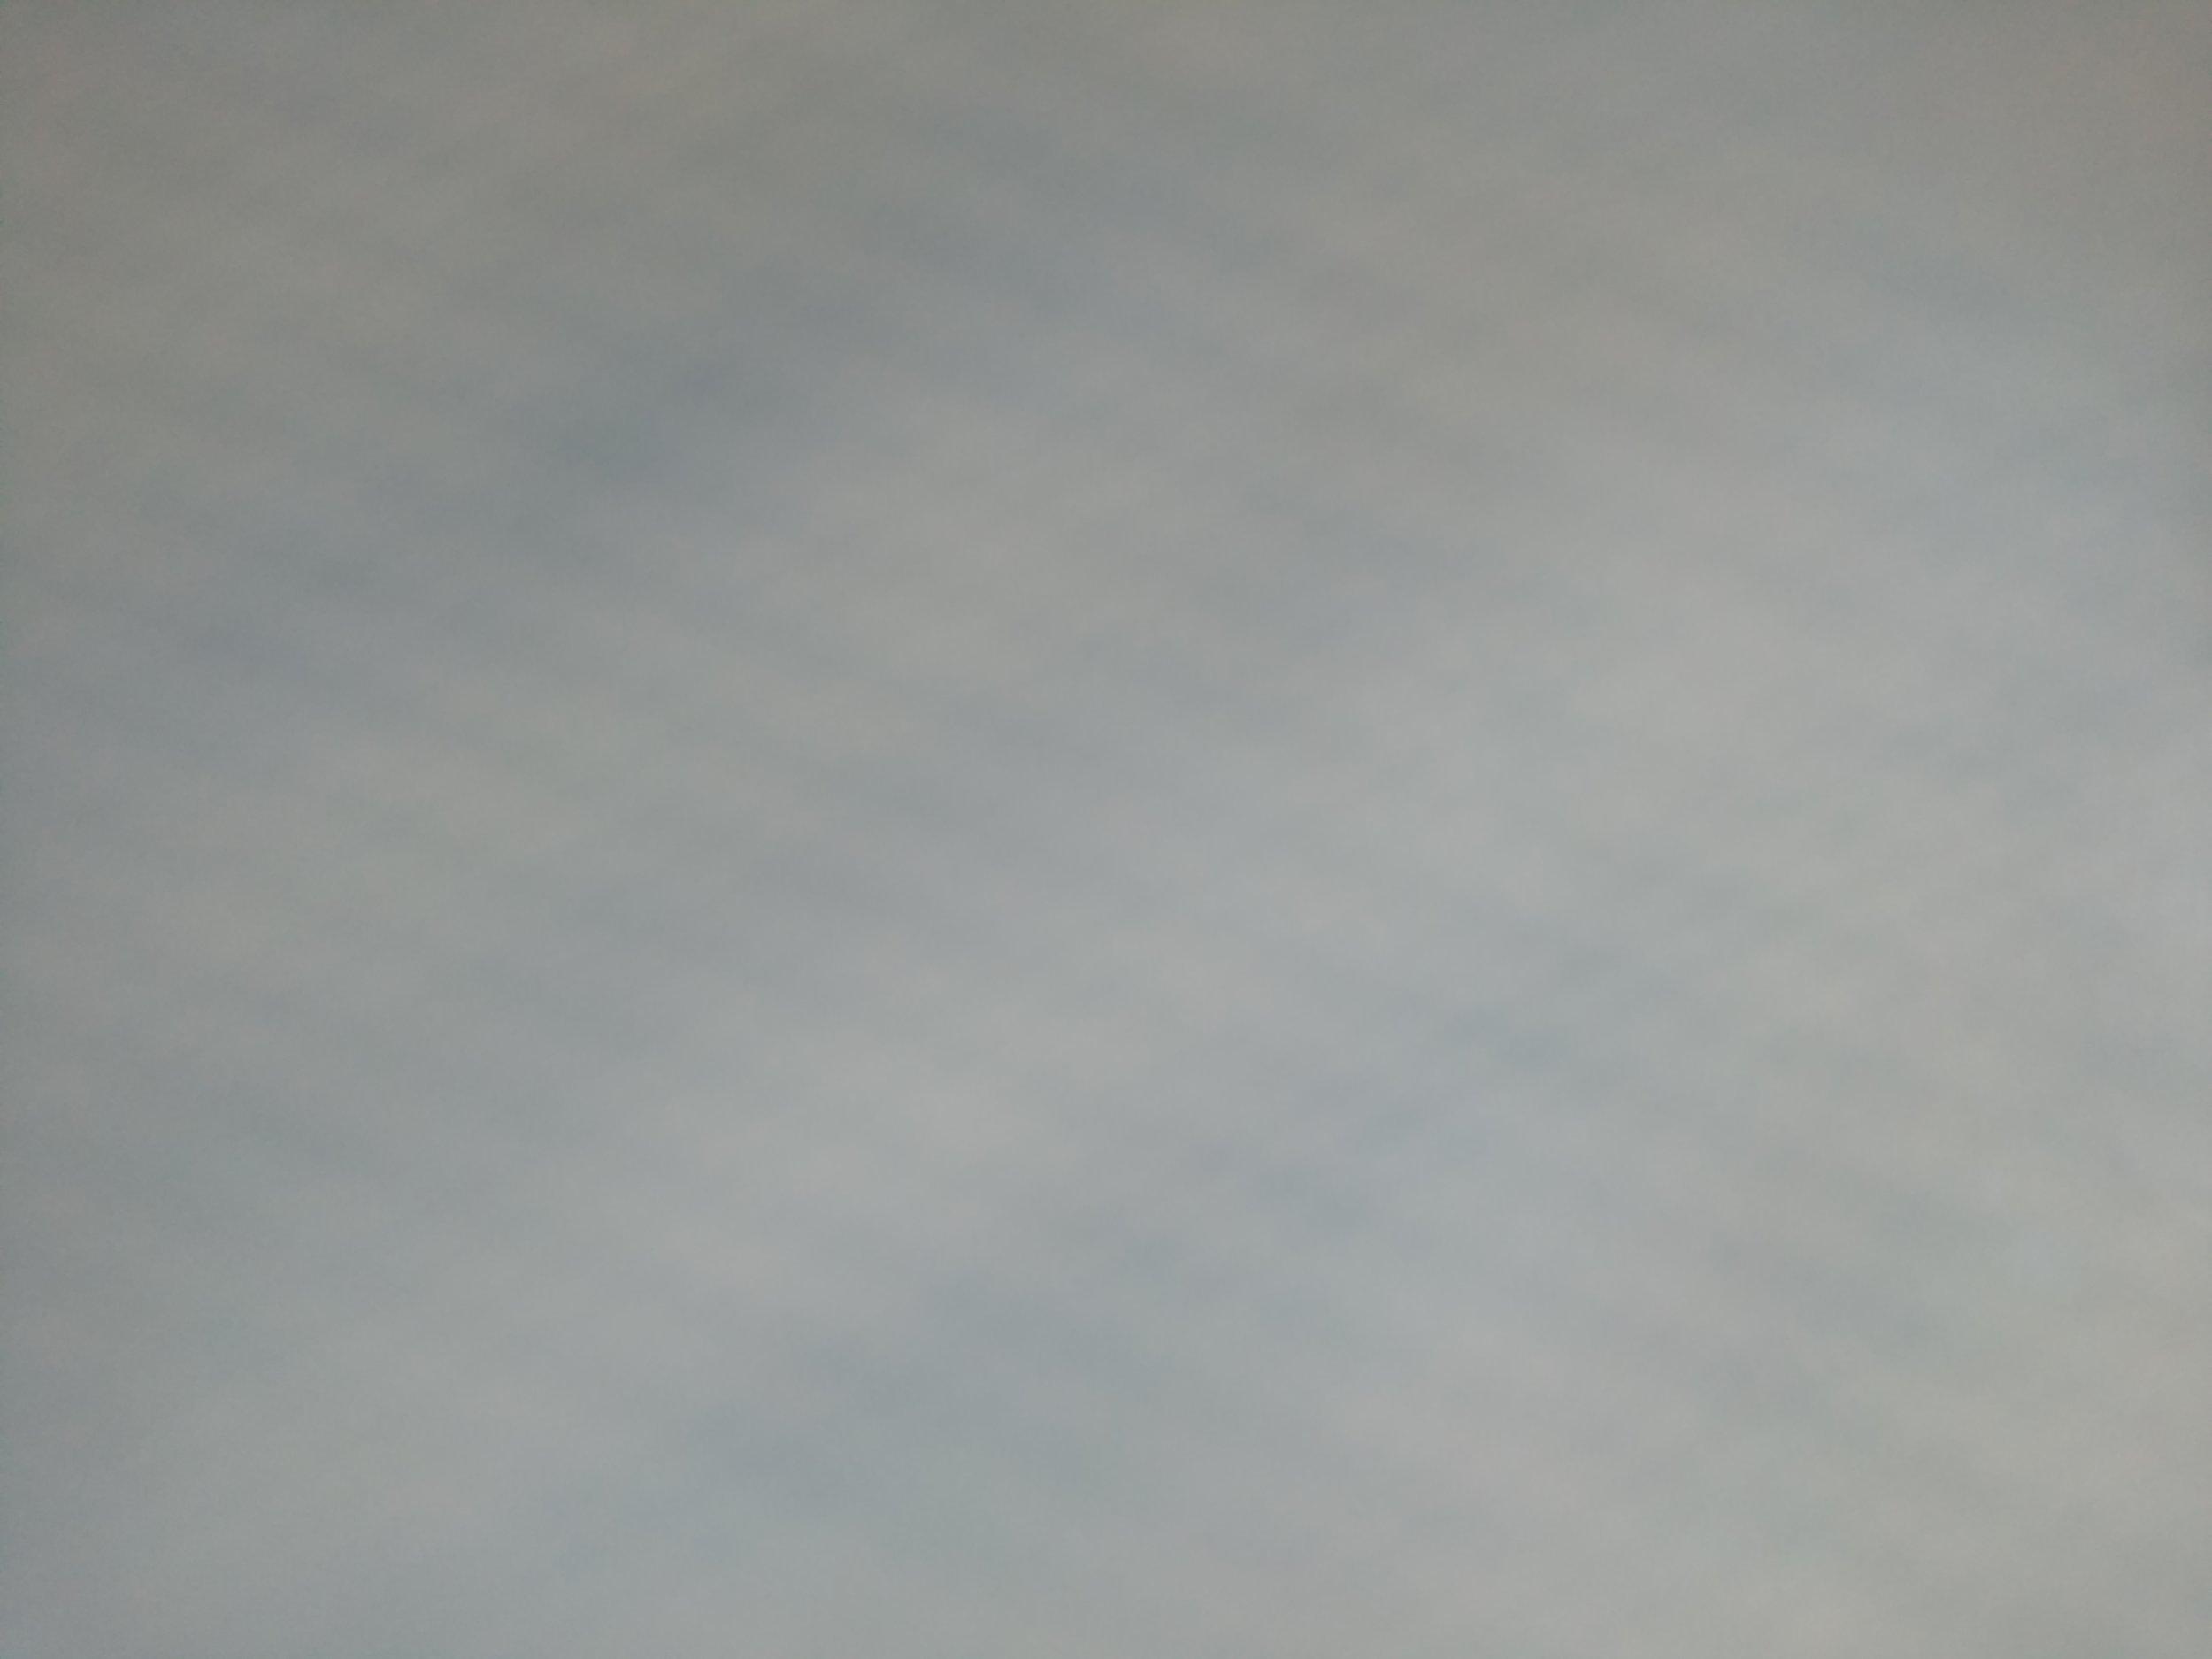 willroth-co-free-texture-gradient-065.jpg